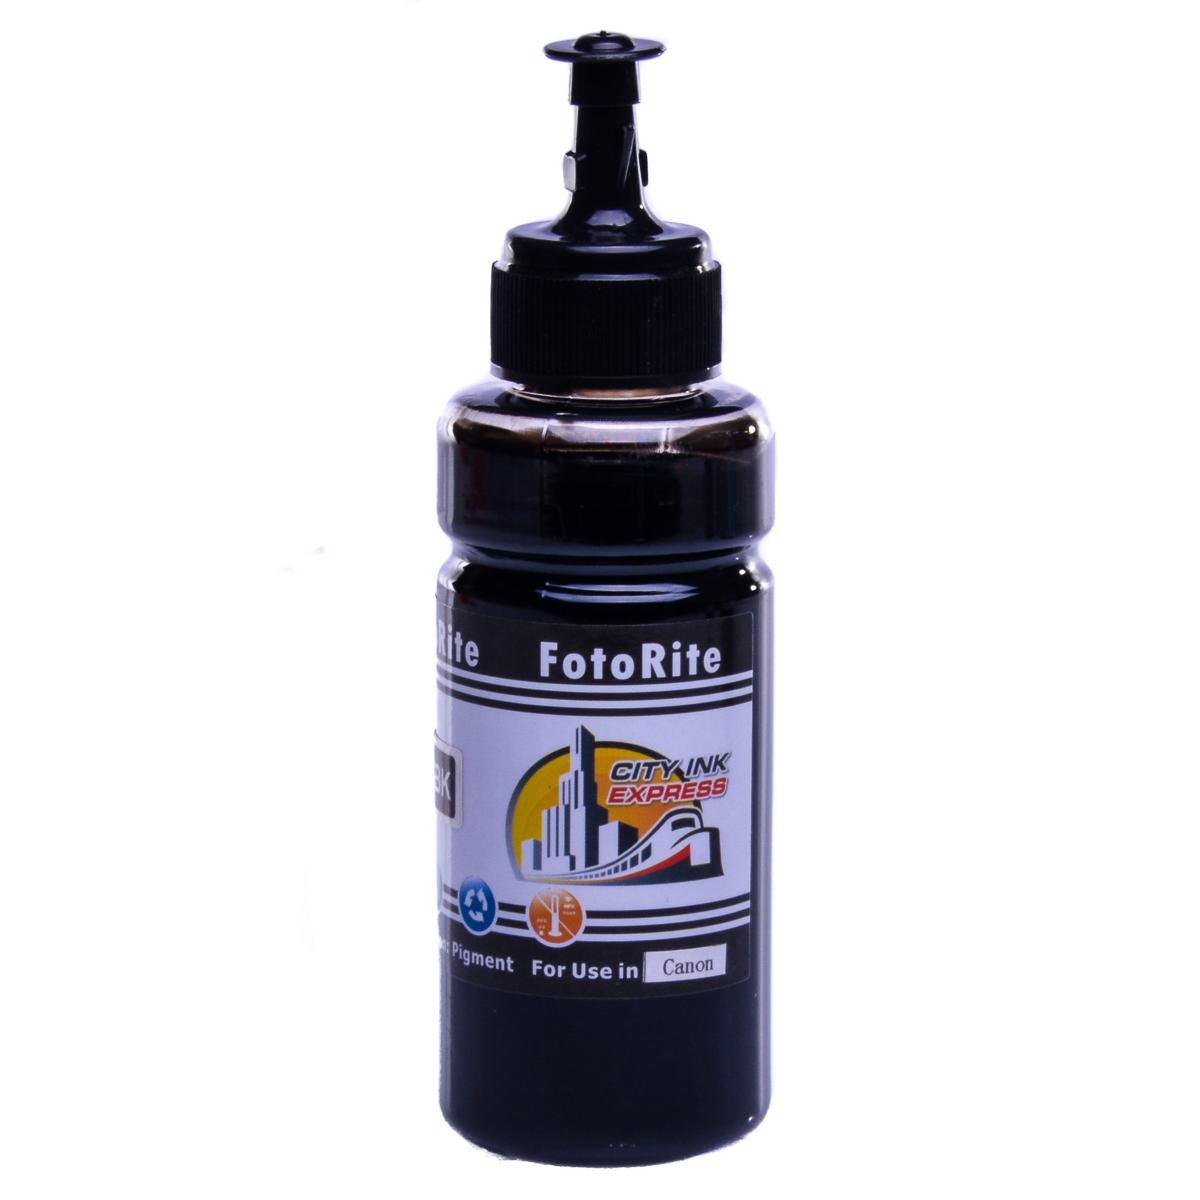 Cheap Pigment Black pigment ink replaces Canon Pixma MX925 - PGI-550BK